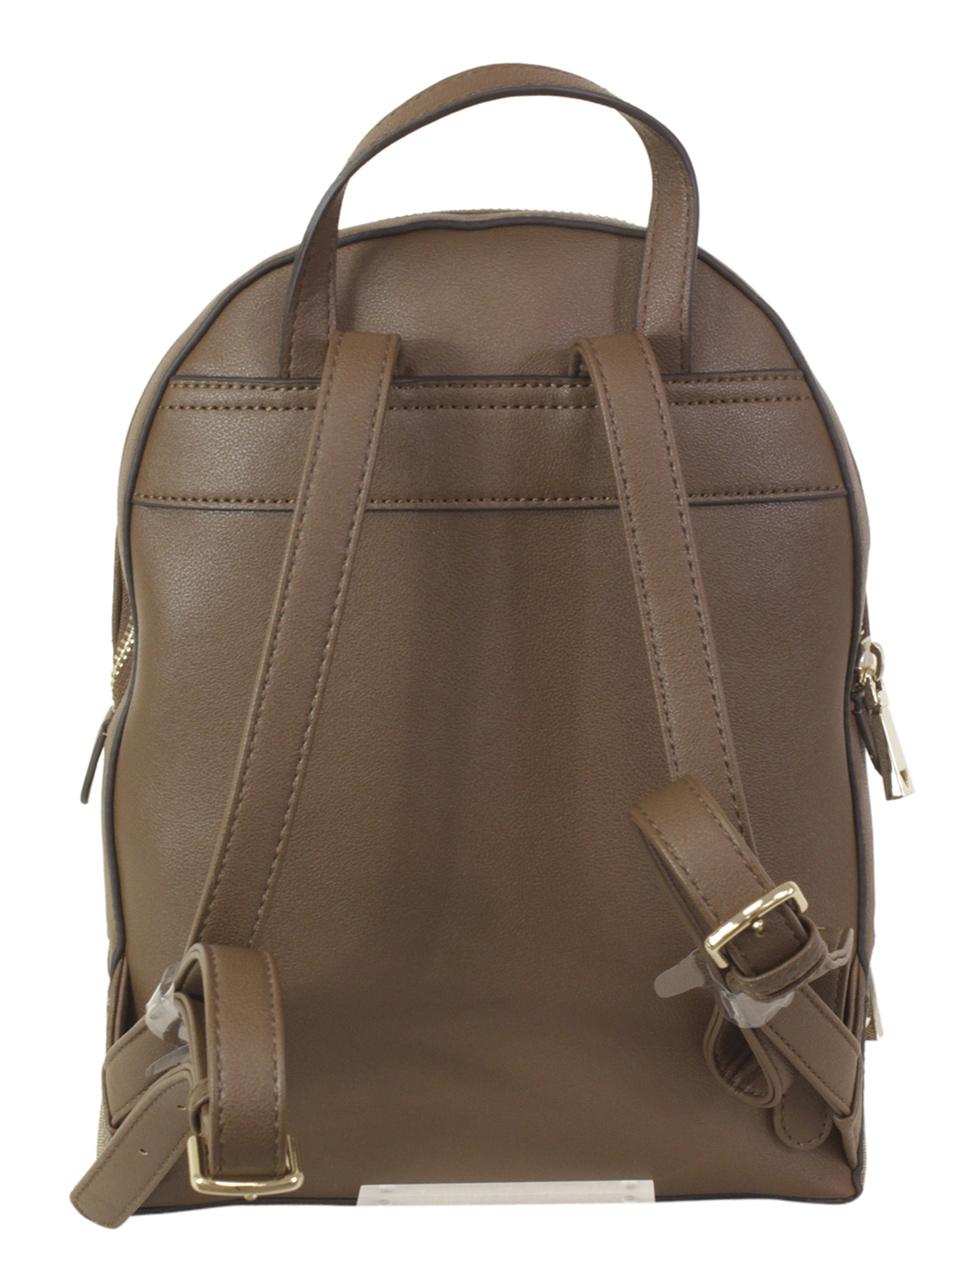 Guess-Women-039-s-Skye-Large-Backpack-Bag thumbnail 8